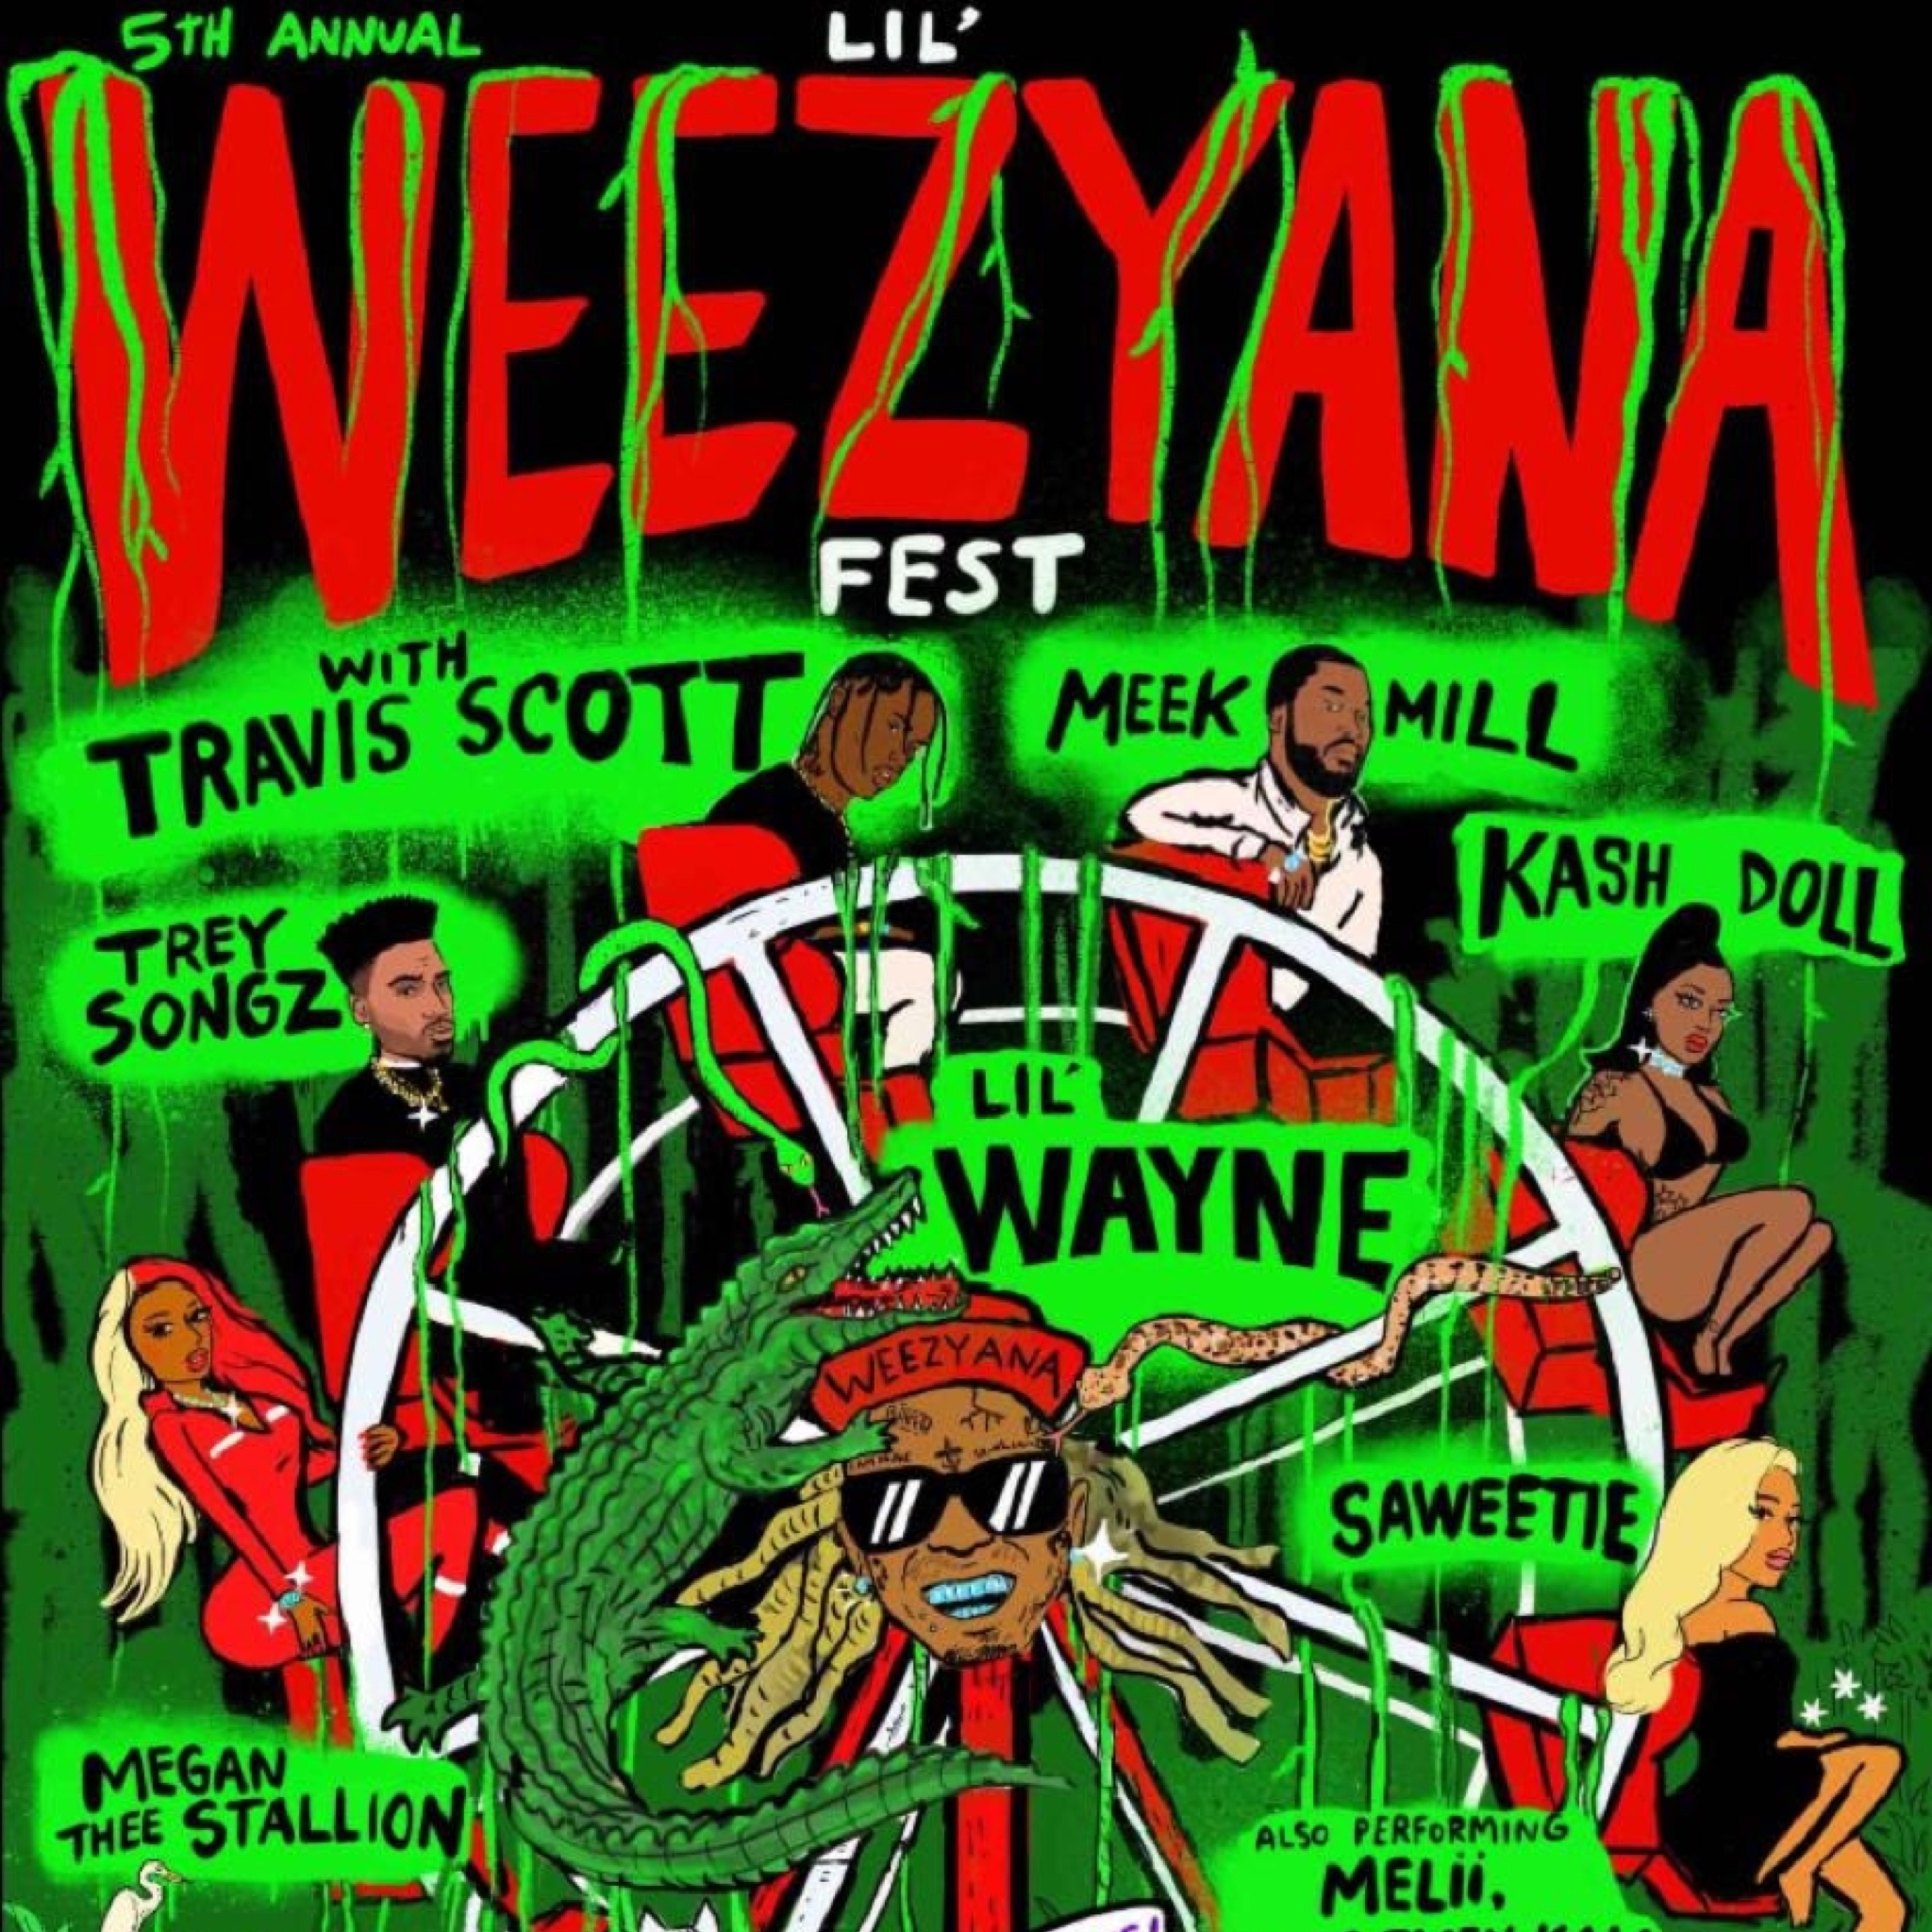 Vaughn Lowery, weezyana, Lil Wayne, 360, 360 magazine, travis Scott, saweetie, meek mill